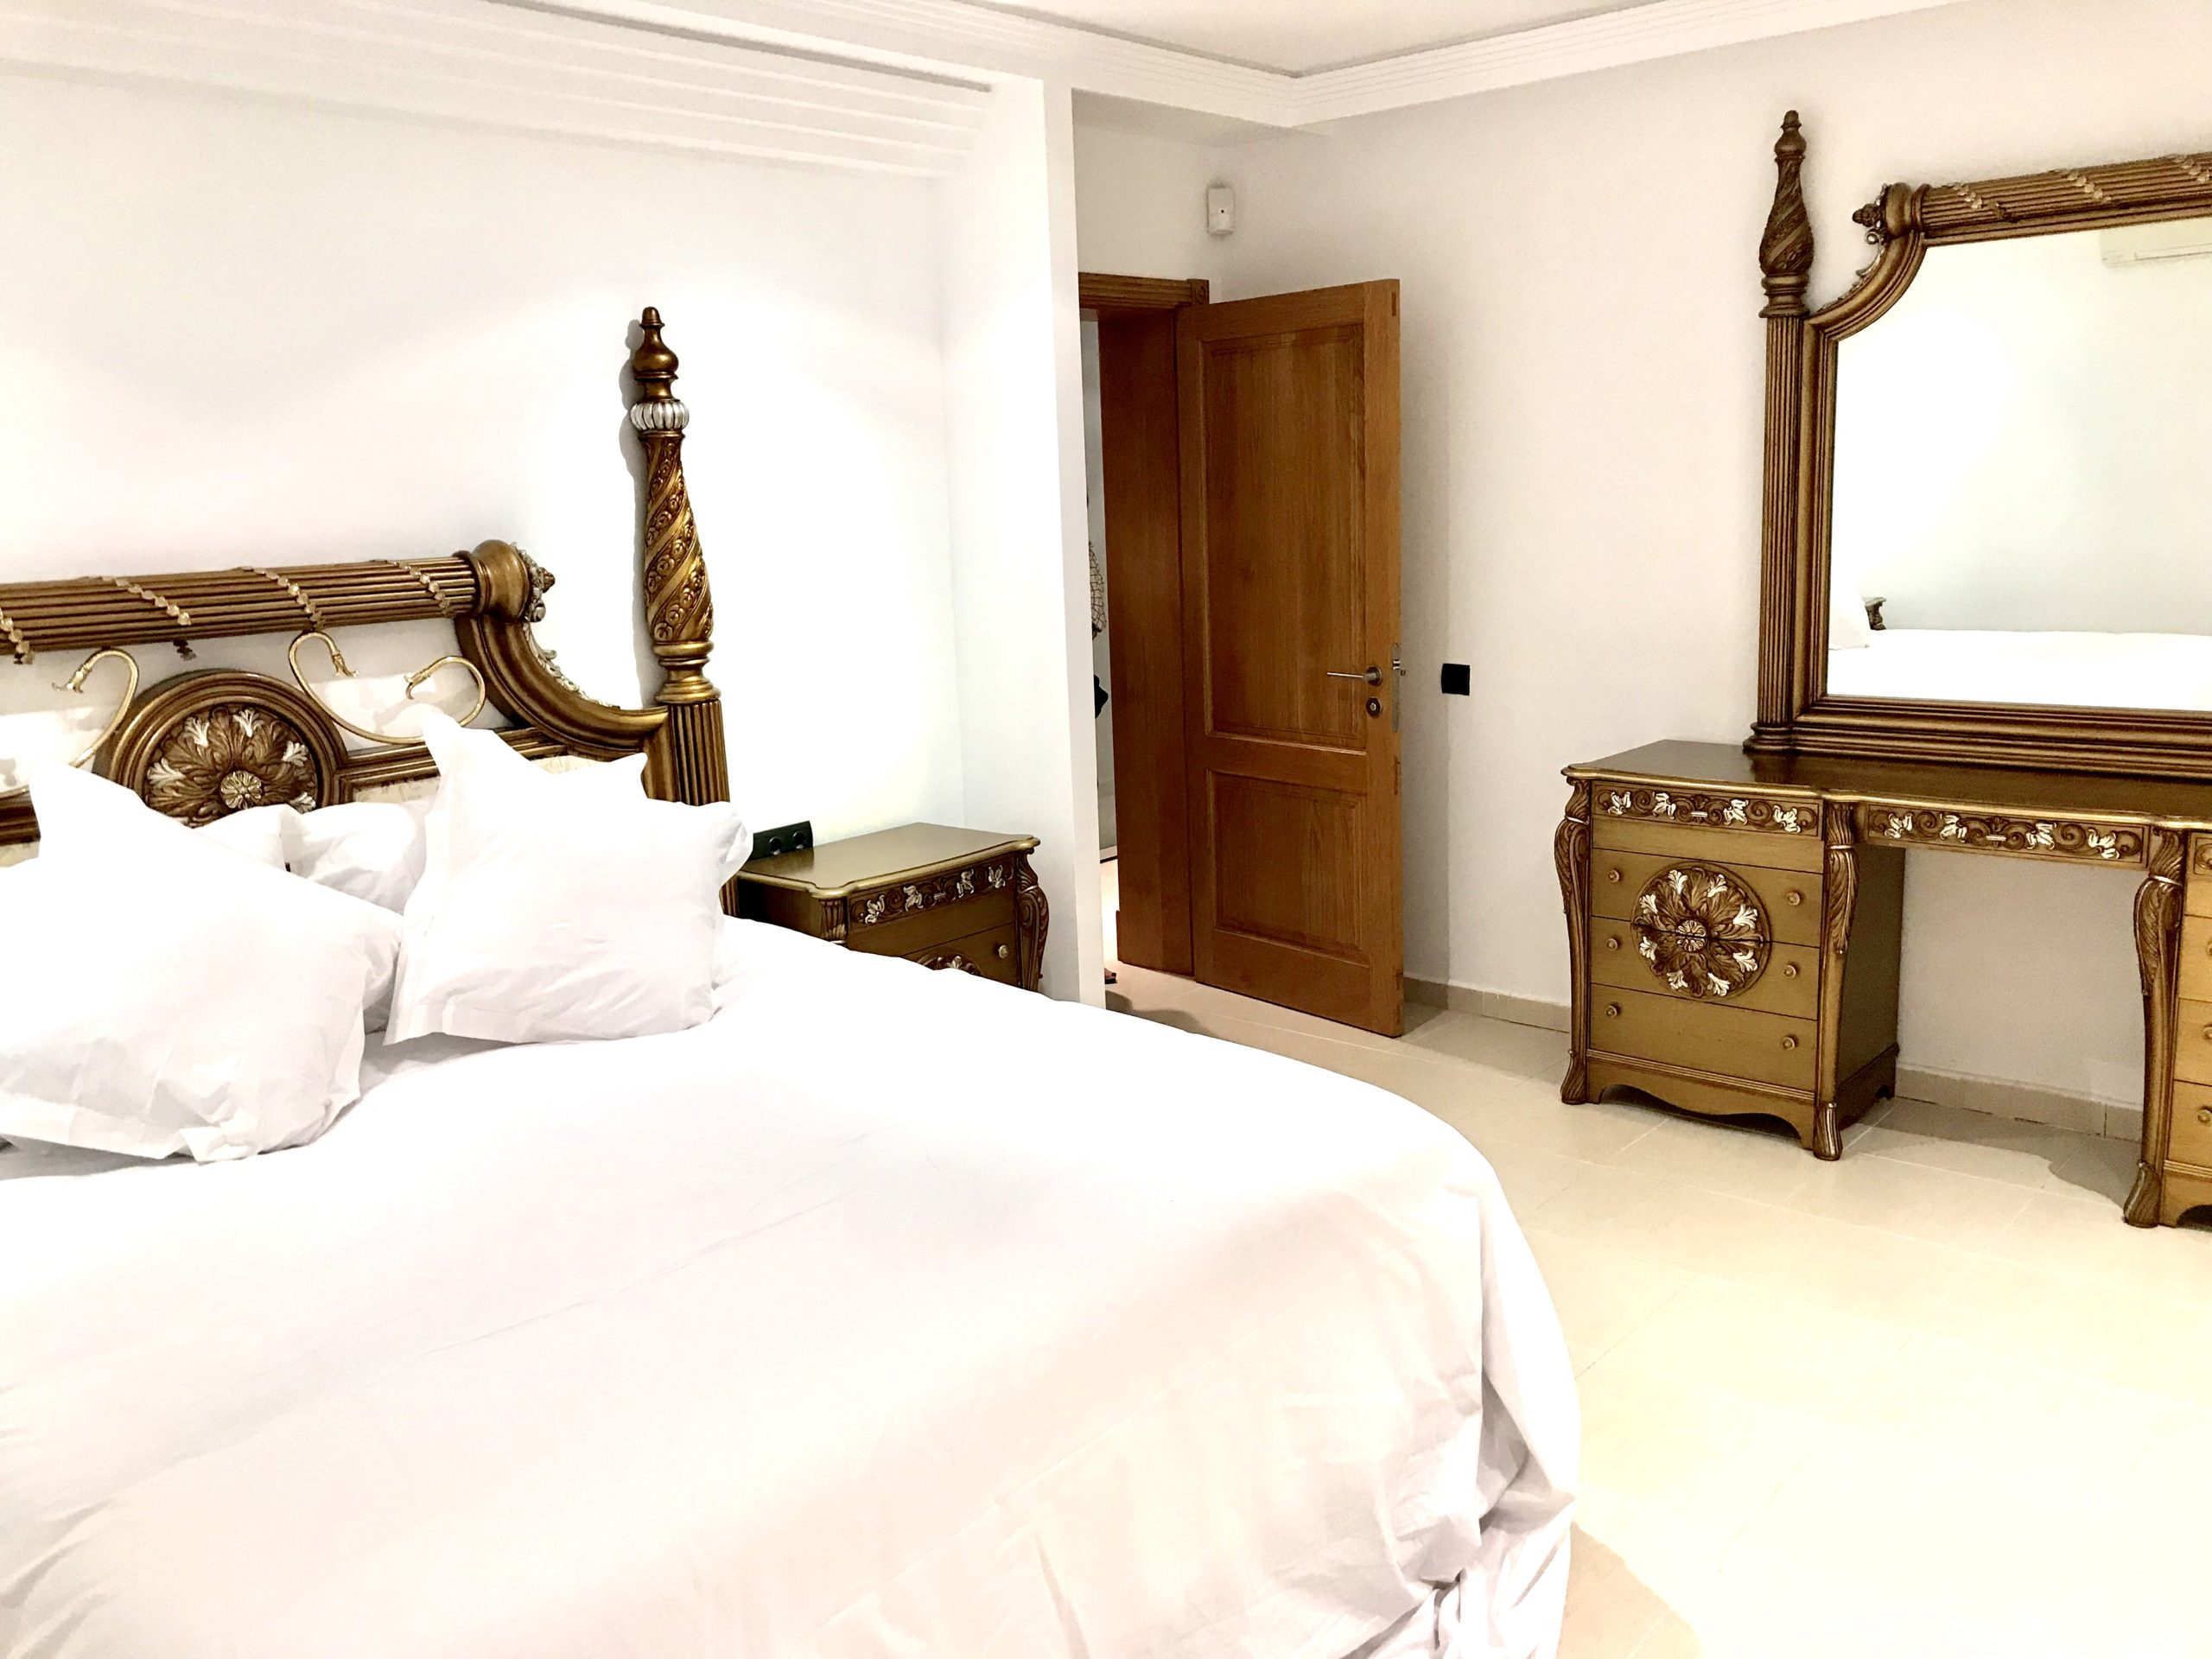 405 villa armoniaIMG_8663